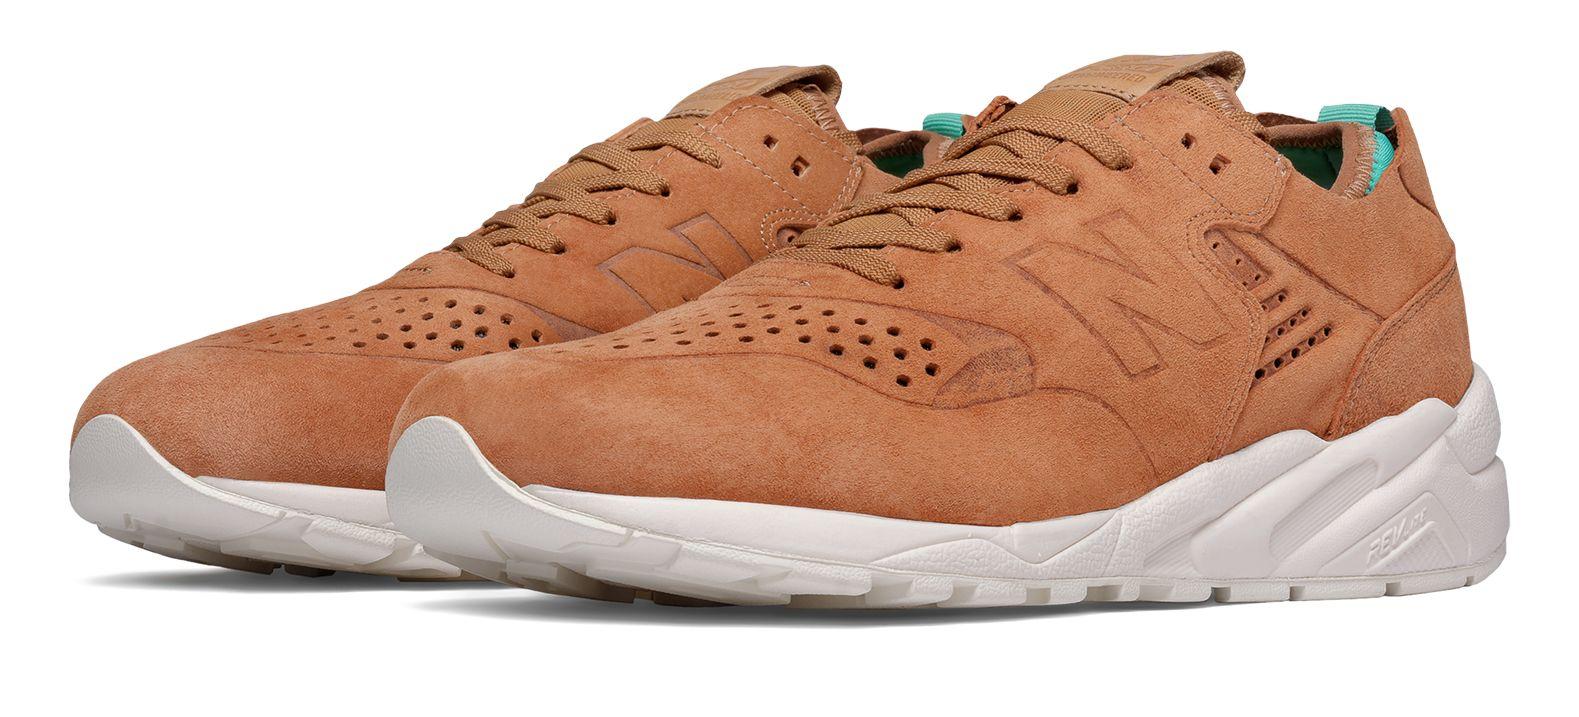 Nouveau Style Mode Sneakers Hommes, New Balance Mrt580Dt